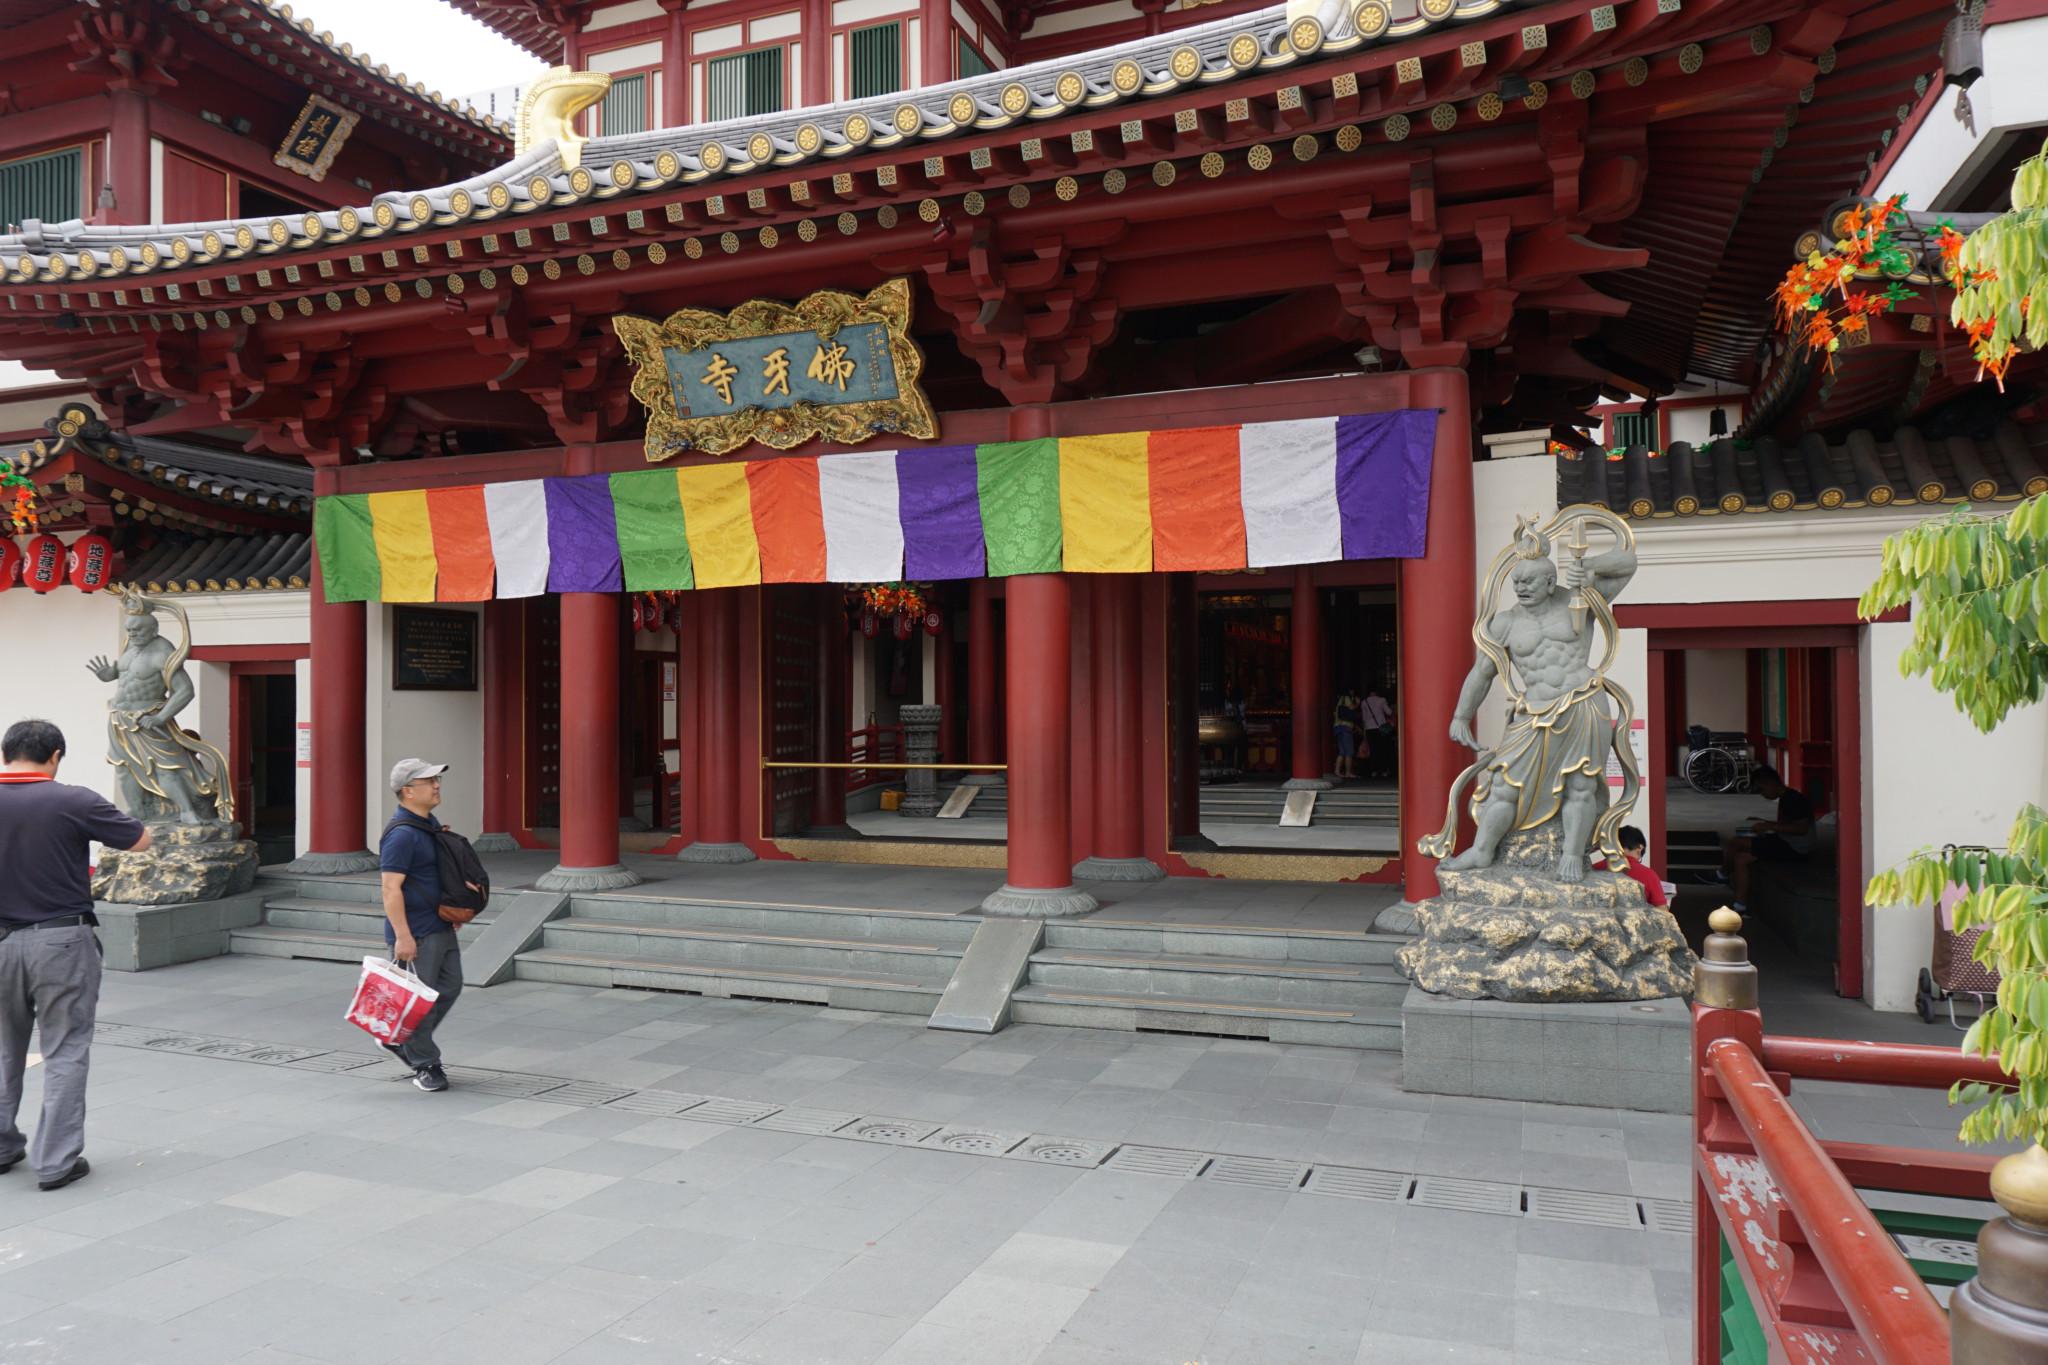 Chinatown Pagoda - Buddhist Temple